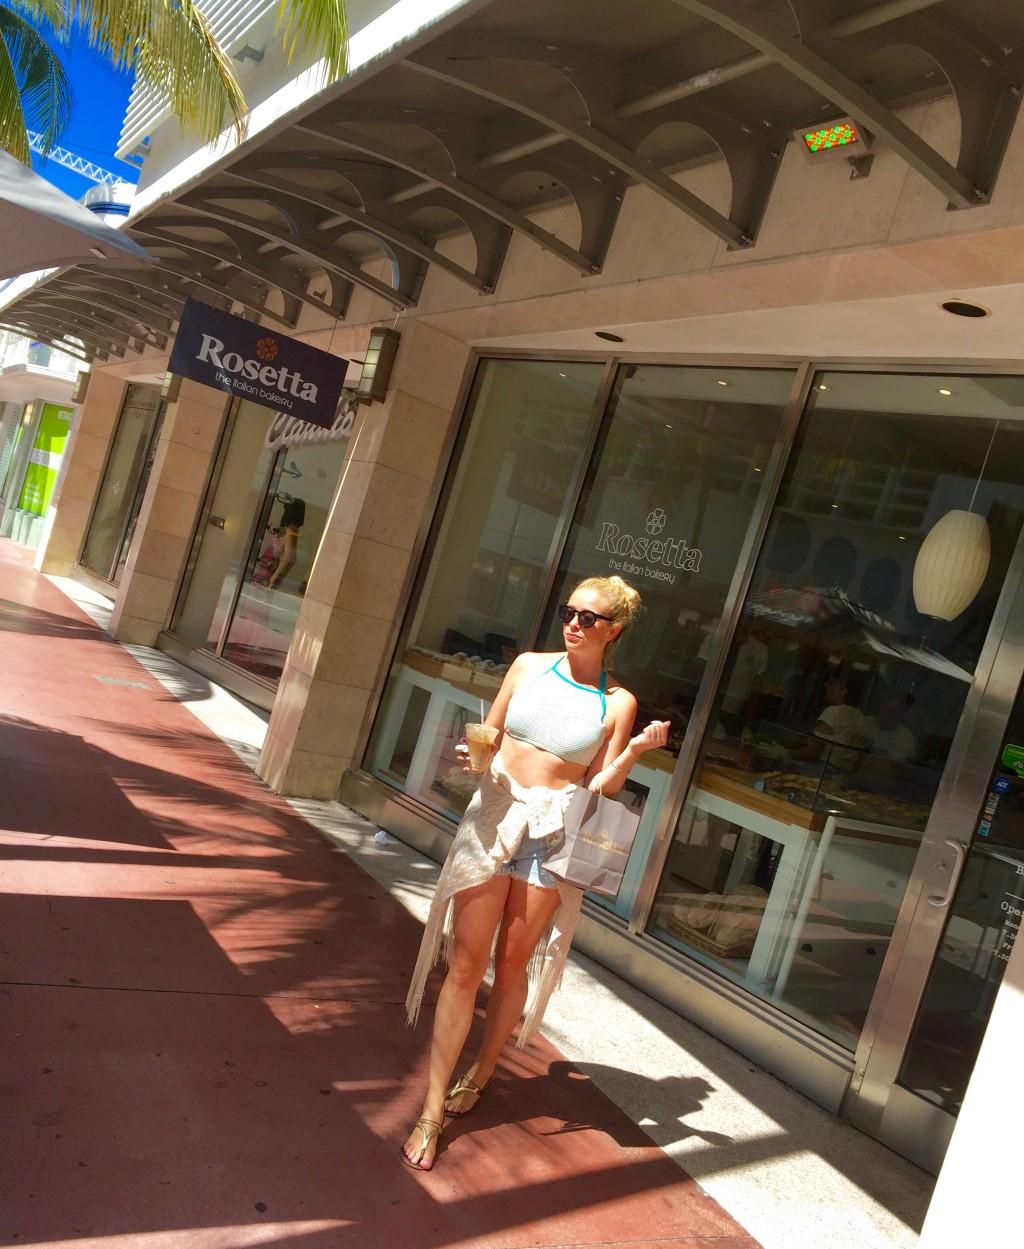 populært sted for frokost i miami merete gamst reiseblogg